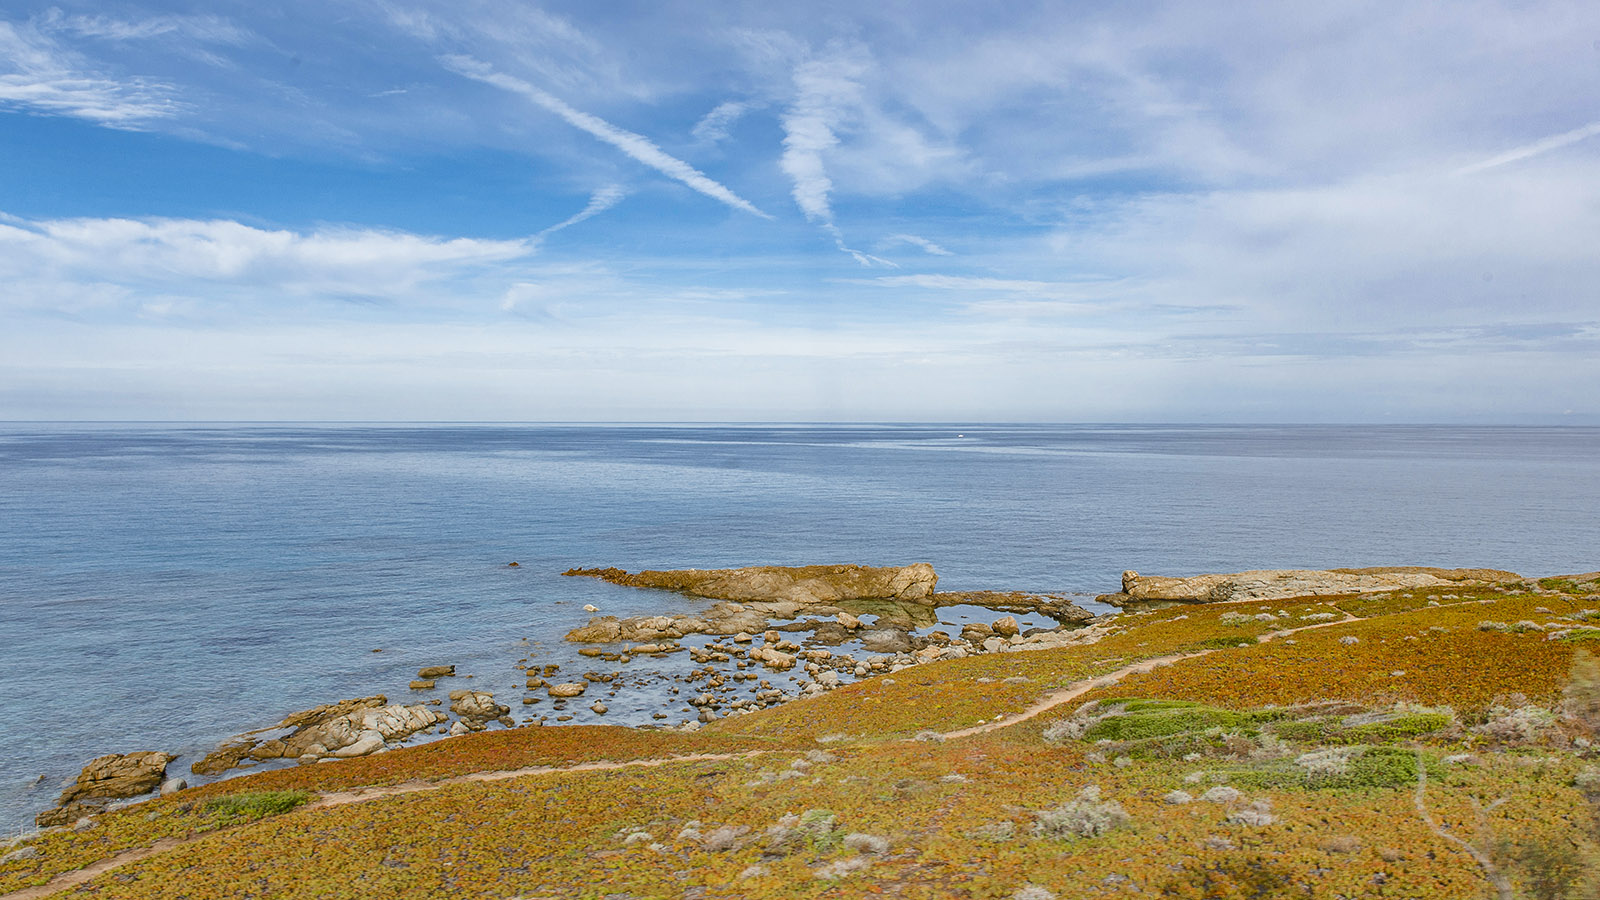 Mit dem Trinighellu von Calvi nach L'Île-Rousse. Foto: Hilke Maunder